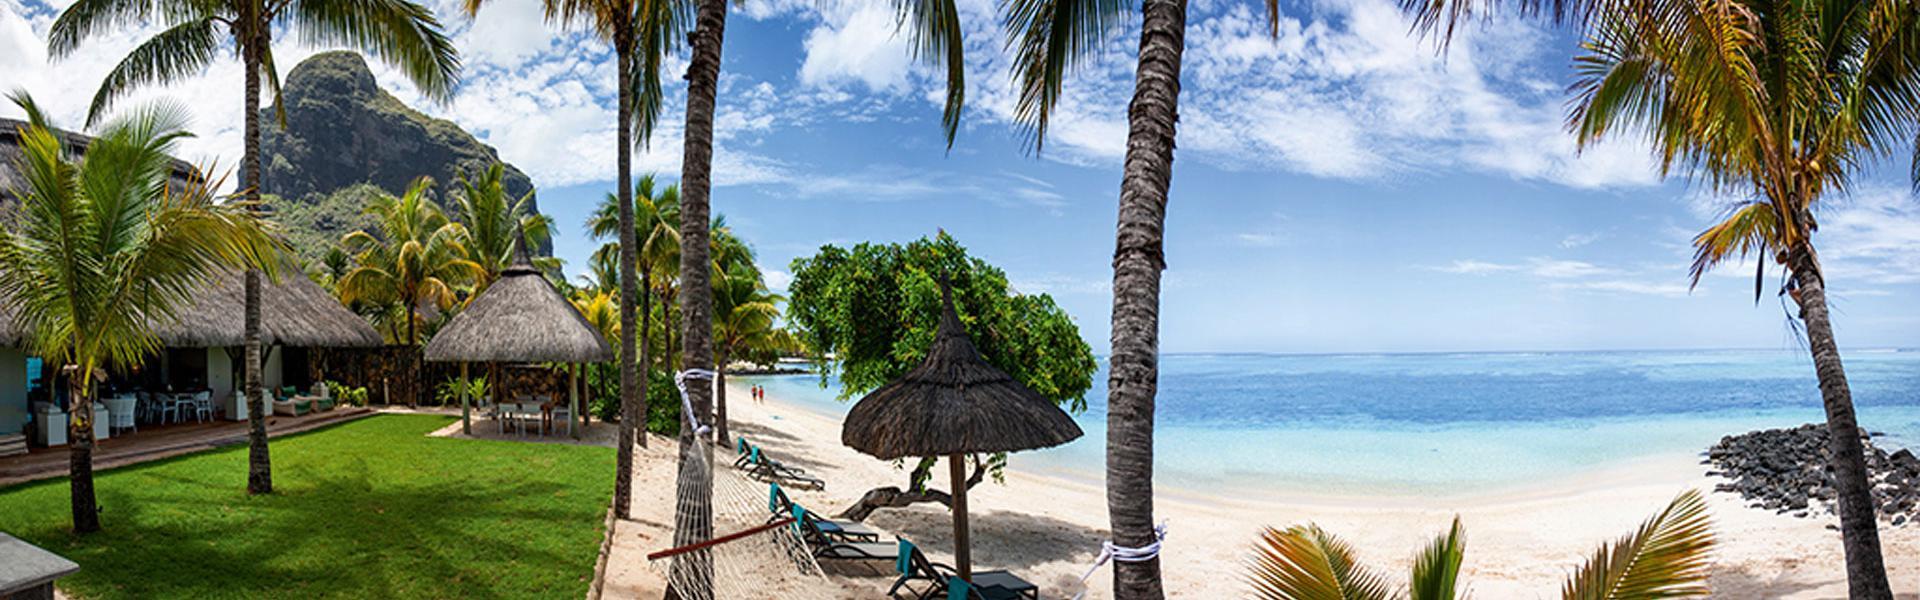 Paradis Beachcomber Golf Resort & Spa (Mauritiusi utazások)